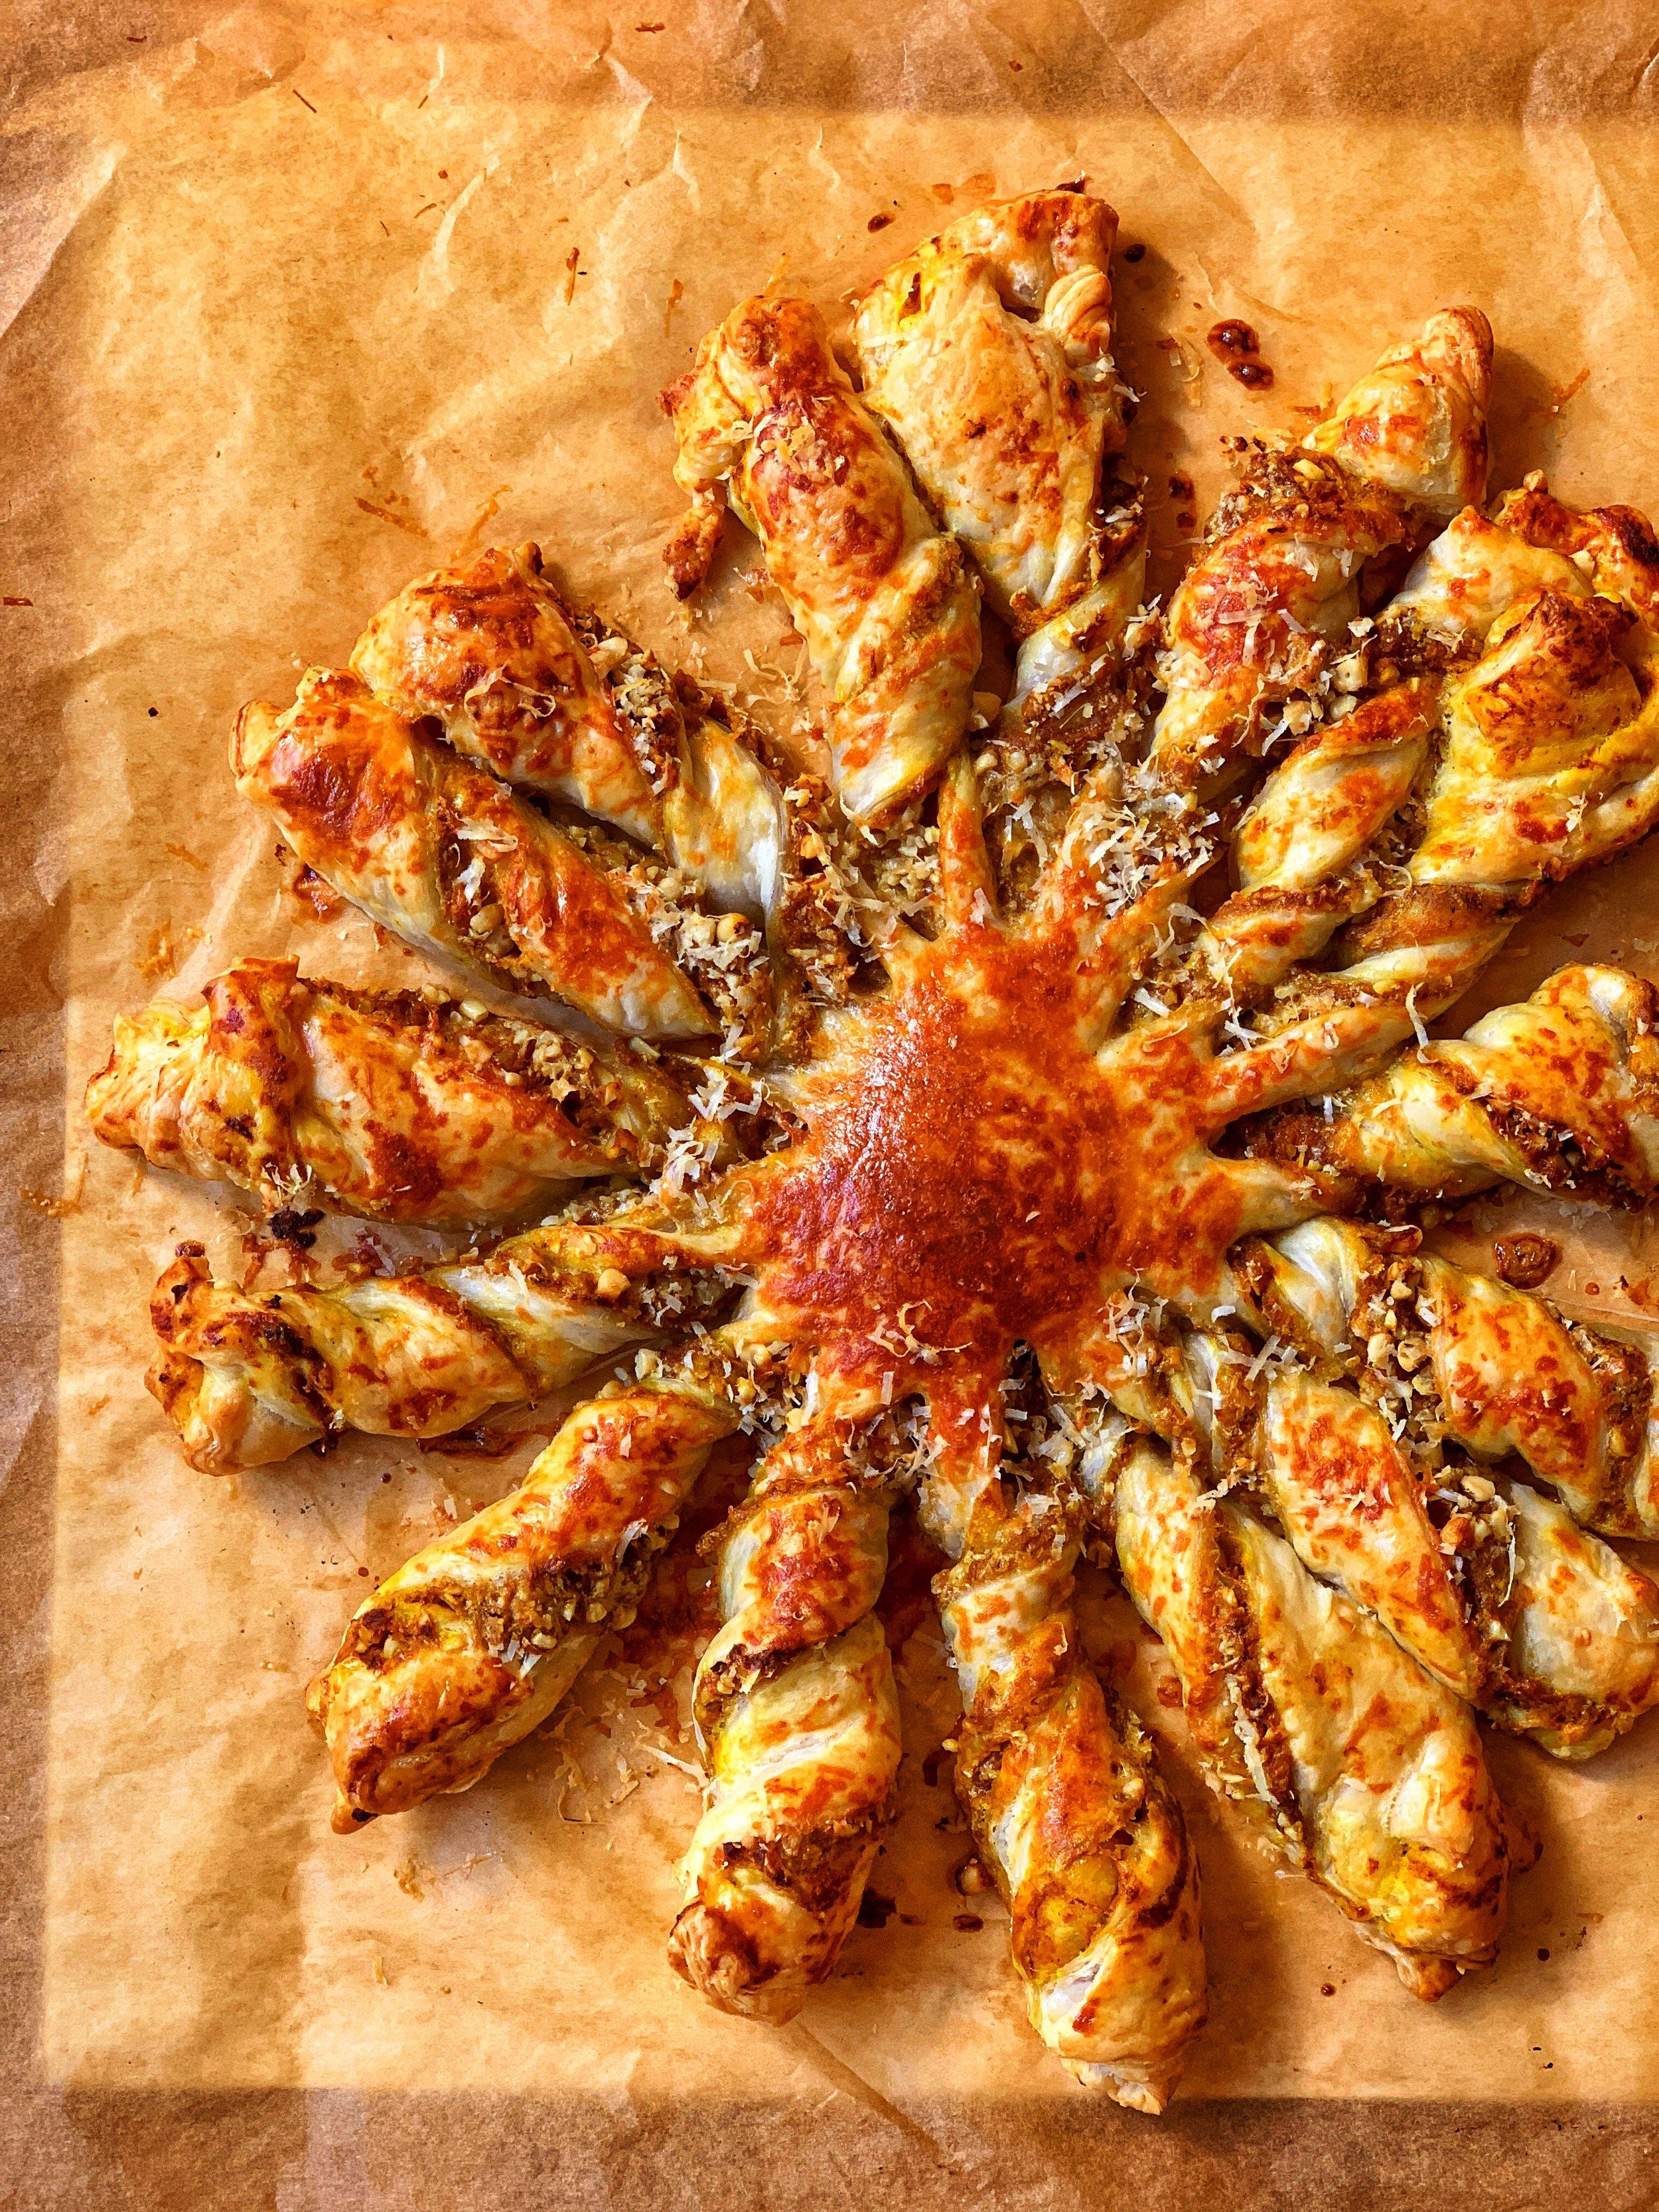 savory pumpkin & sage tarte soleil with pine nuts